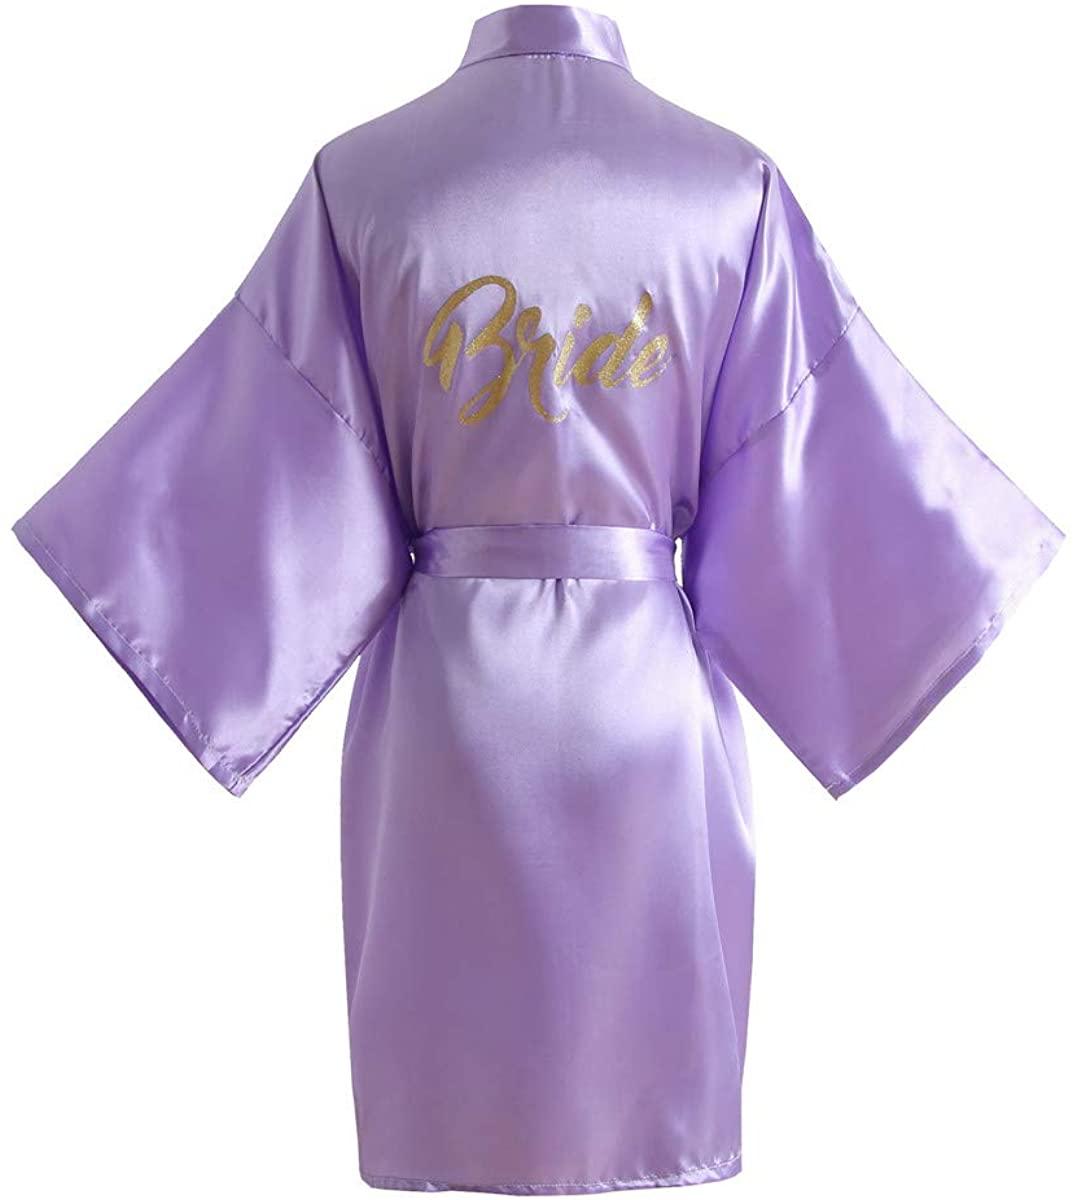 Shanghai Story Satin Bridal Robes Kimono Wedding Party Getting Ready Robe with Gold Glitter or Rhinestones